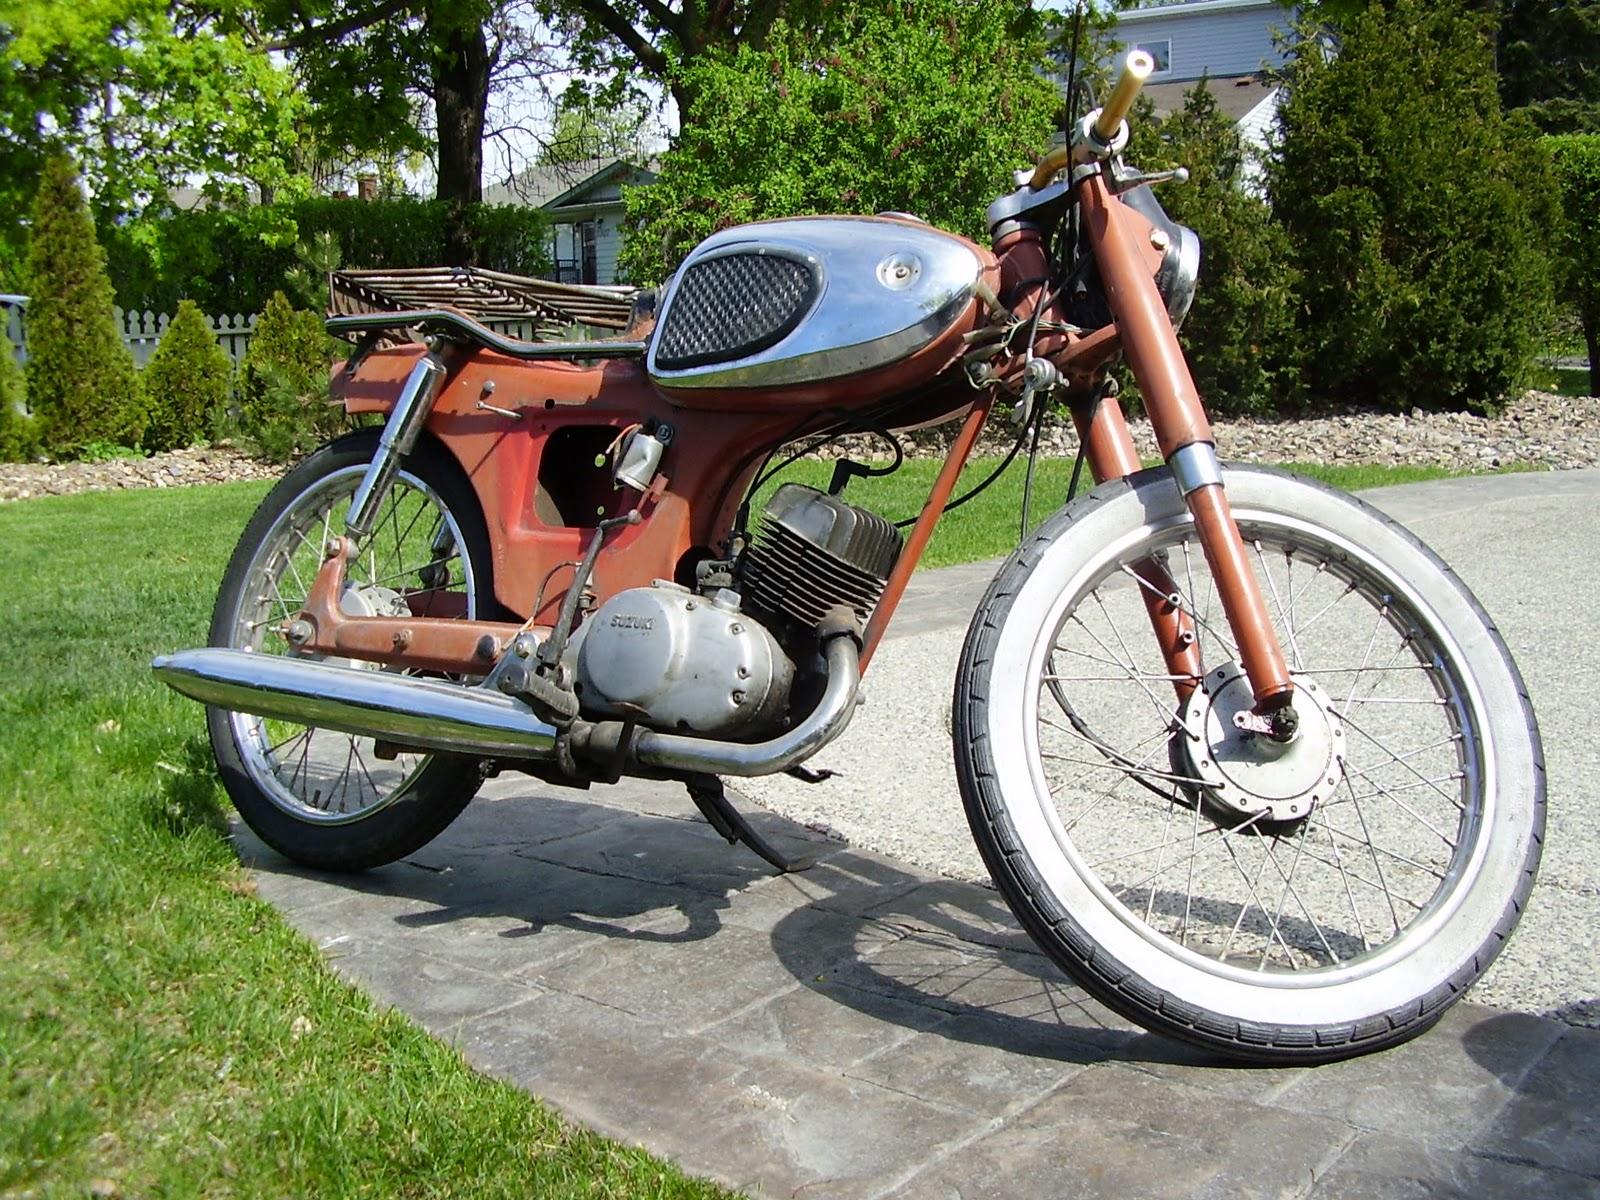 Suzuki Motorcycle Dealer Bay Area